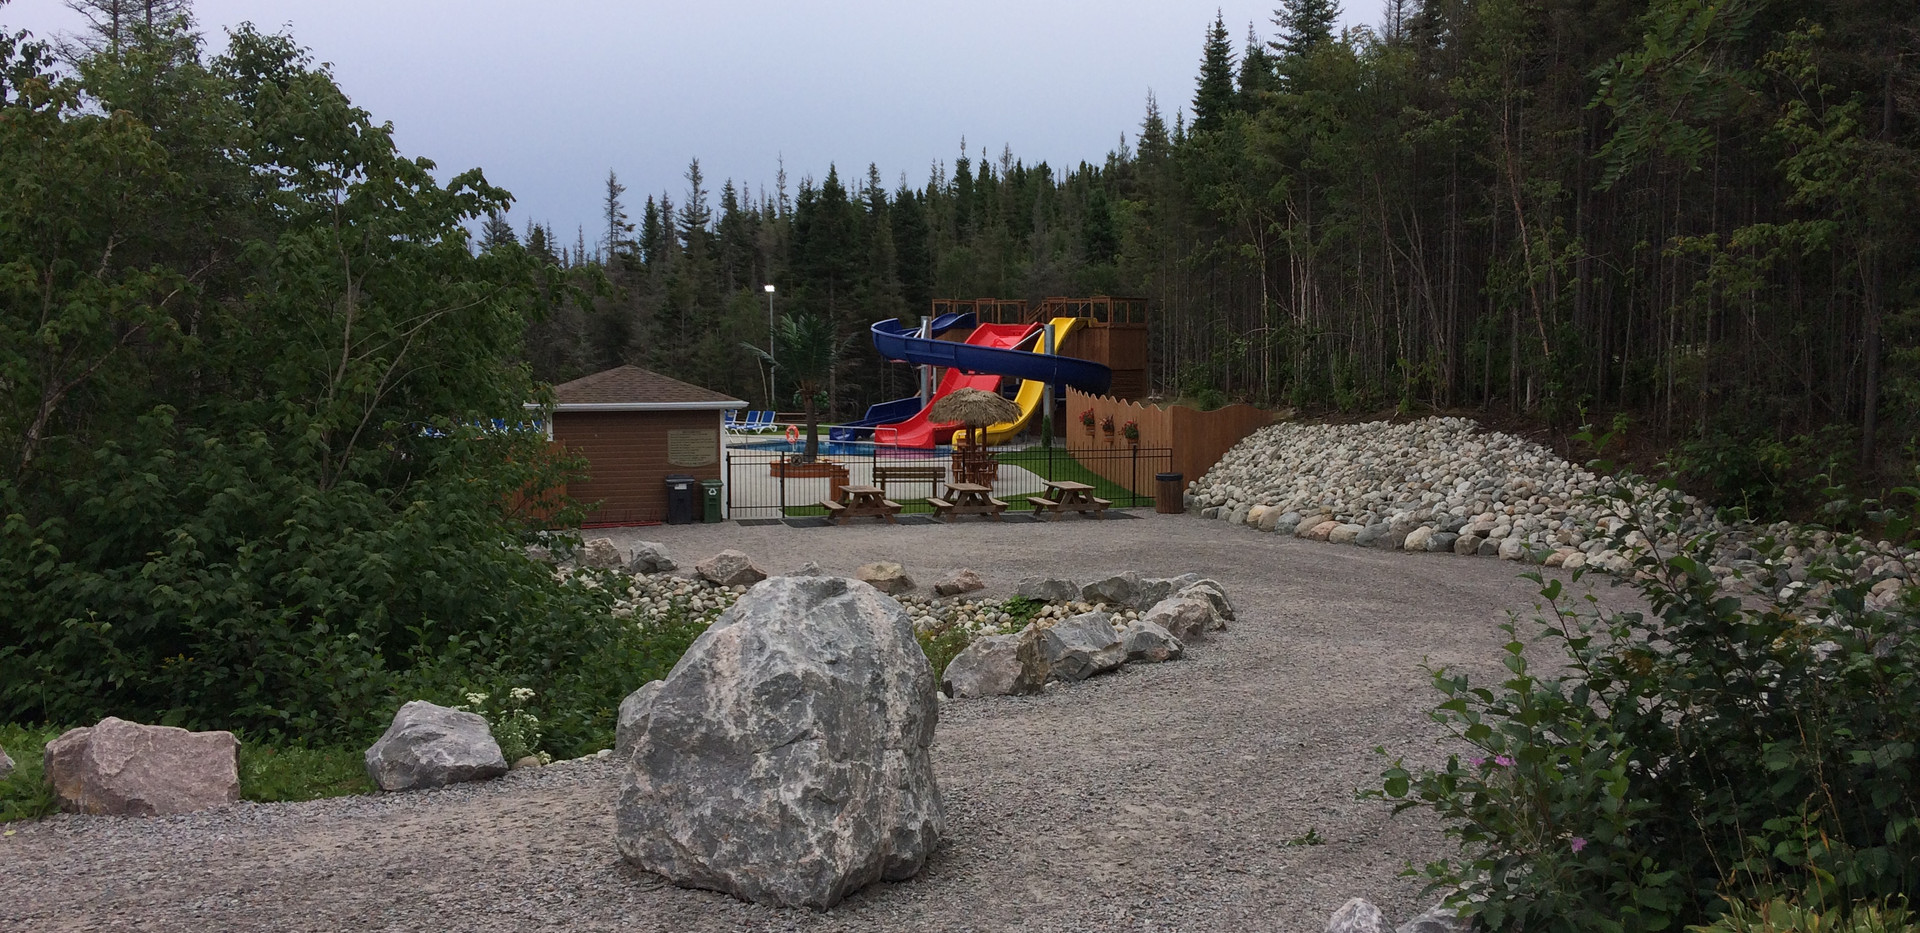 piscine-glissade-eau-camping-boreal-5.JP